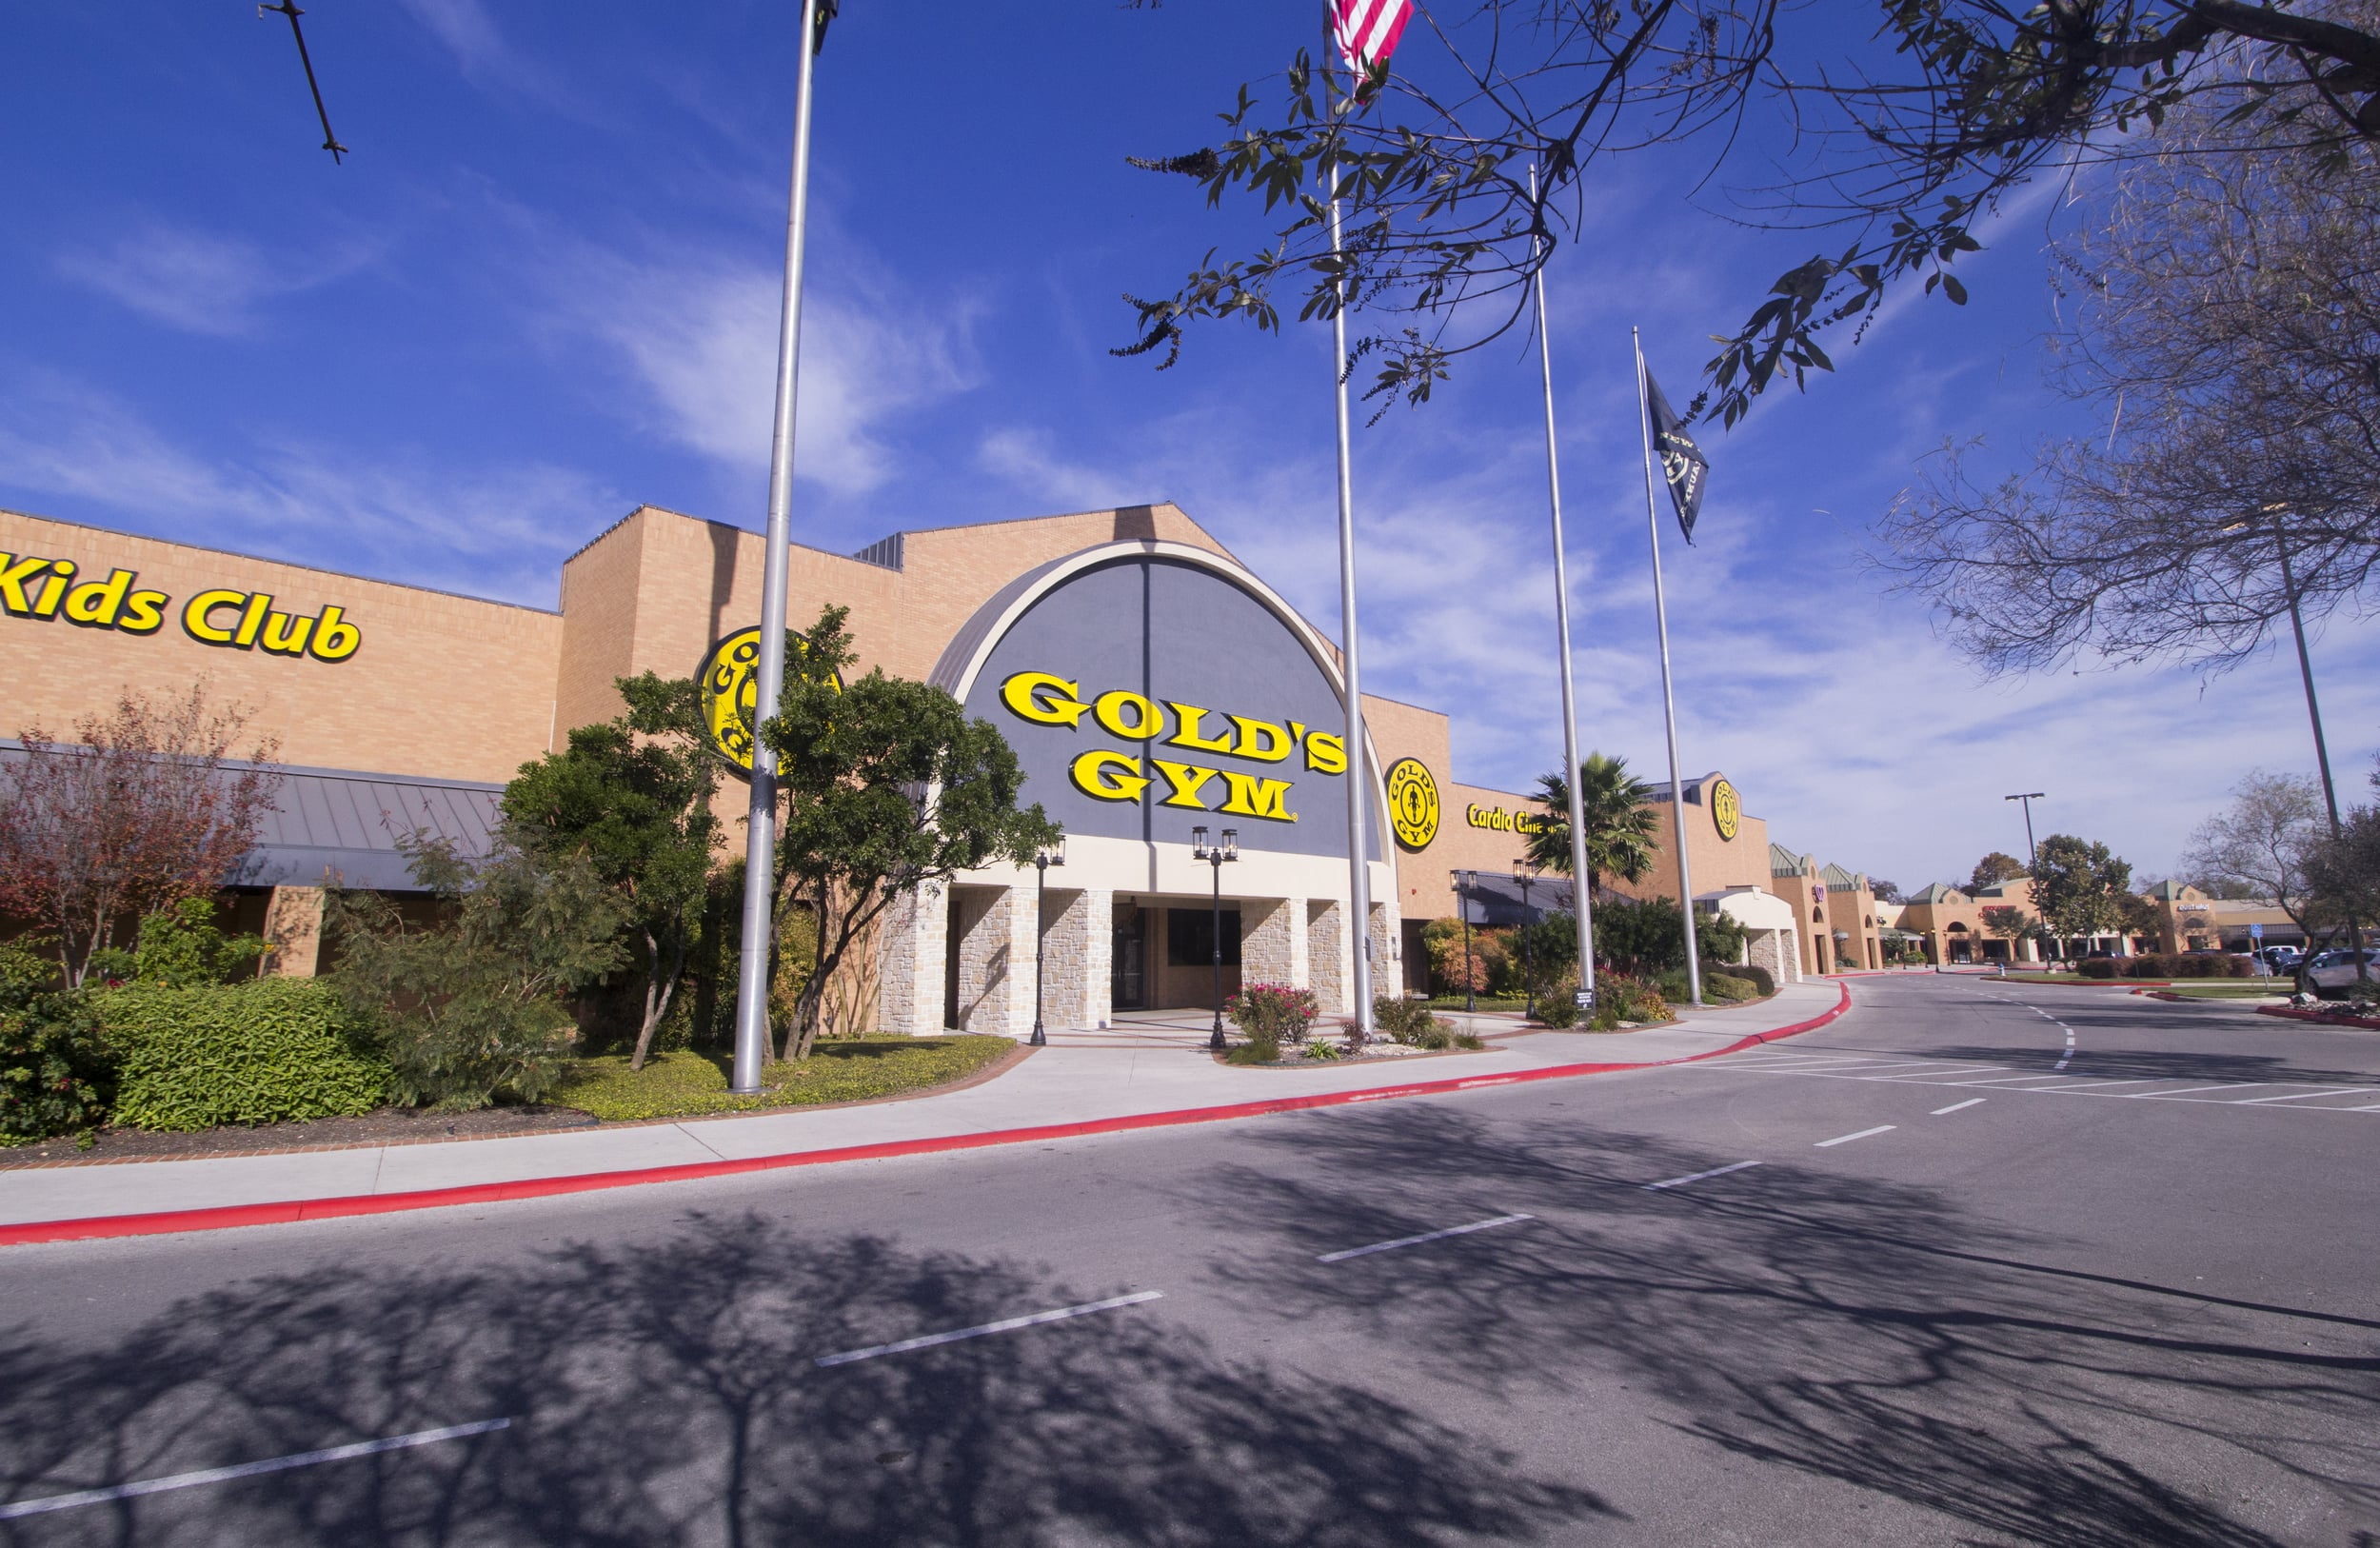 Golds Gym, New Braunfels, TX